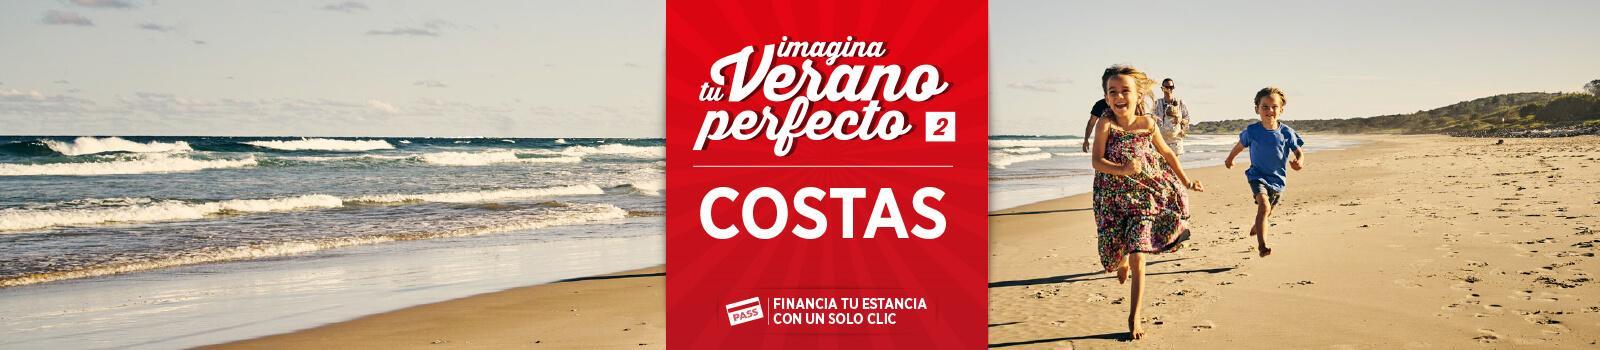 Hoteles baratos Playa Verano